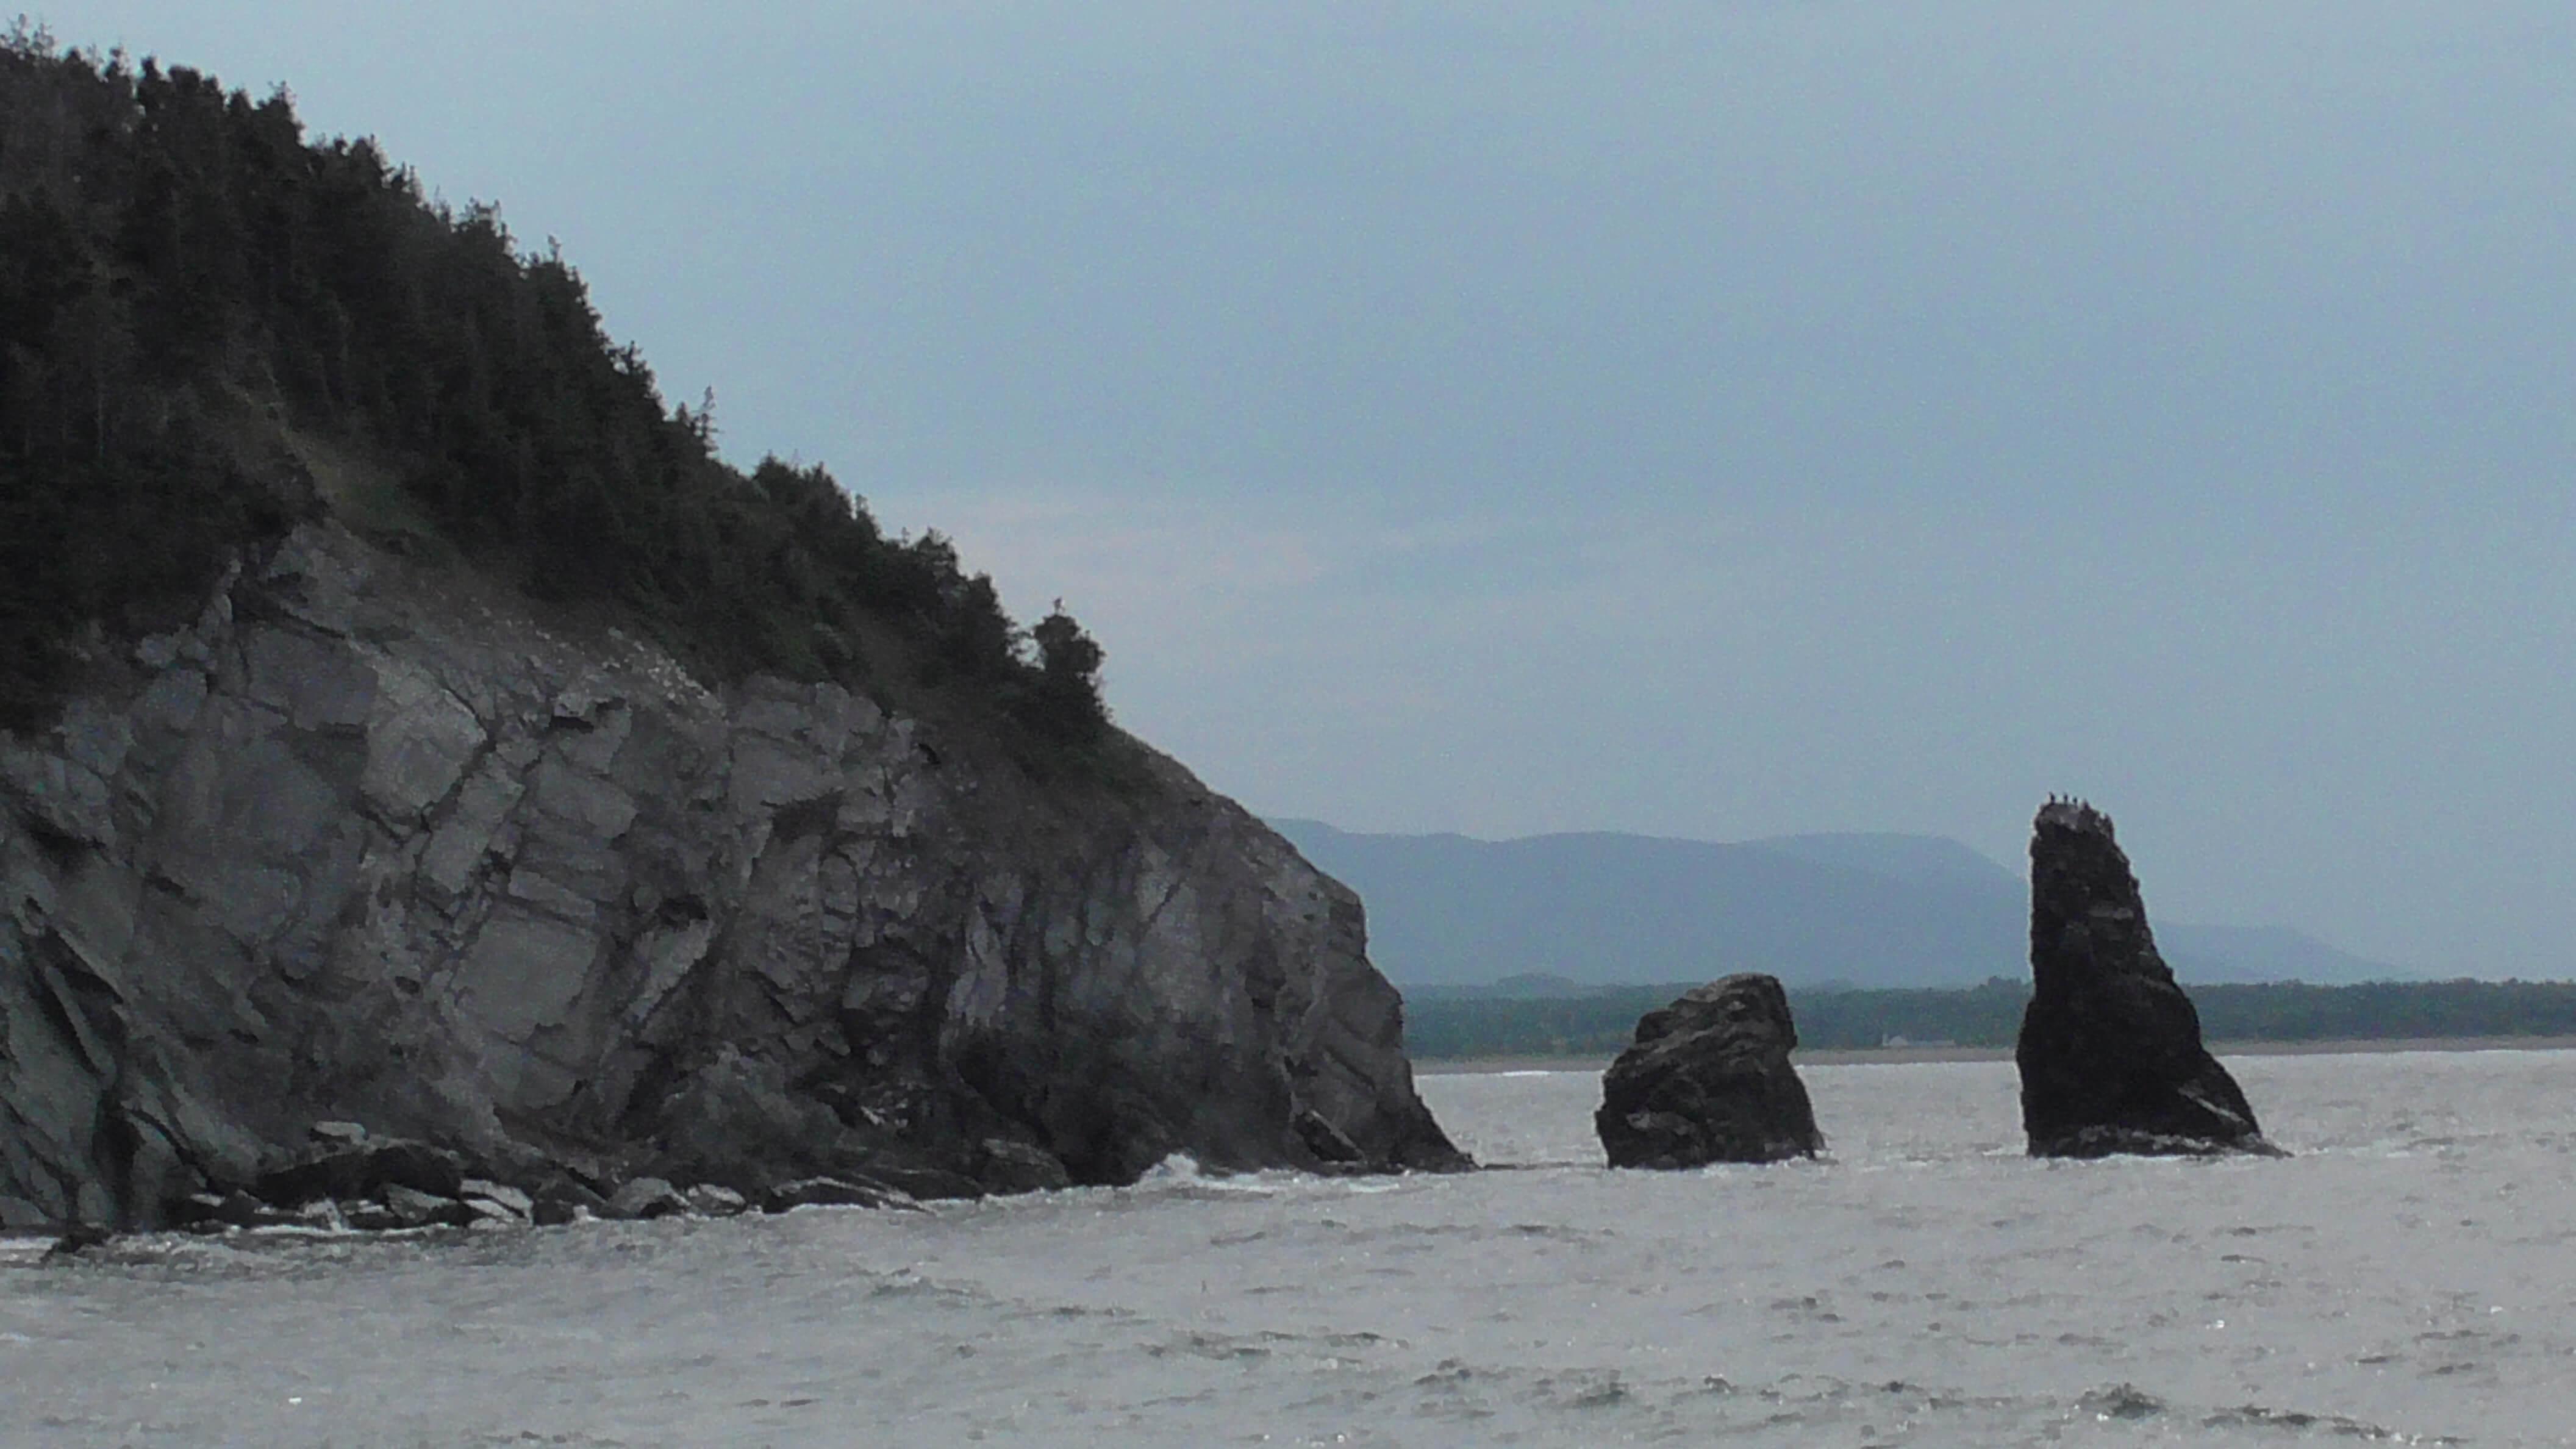 Pillar Rock, West Side, Cape Breton Highlands National Park, Nova Scotia